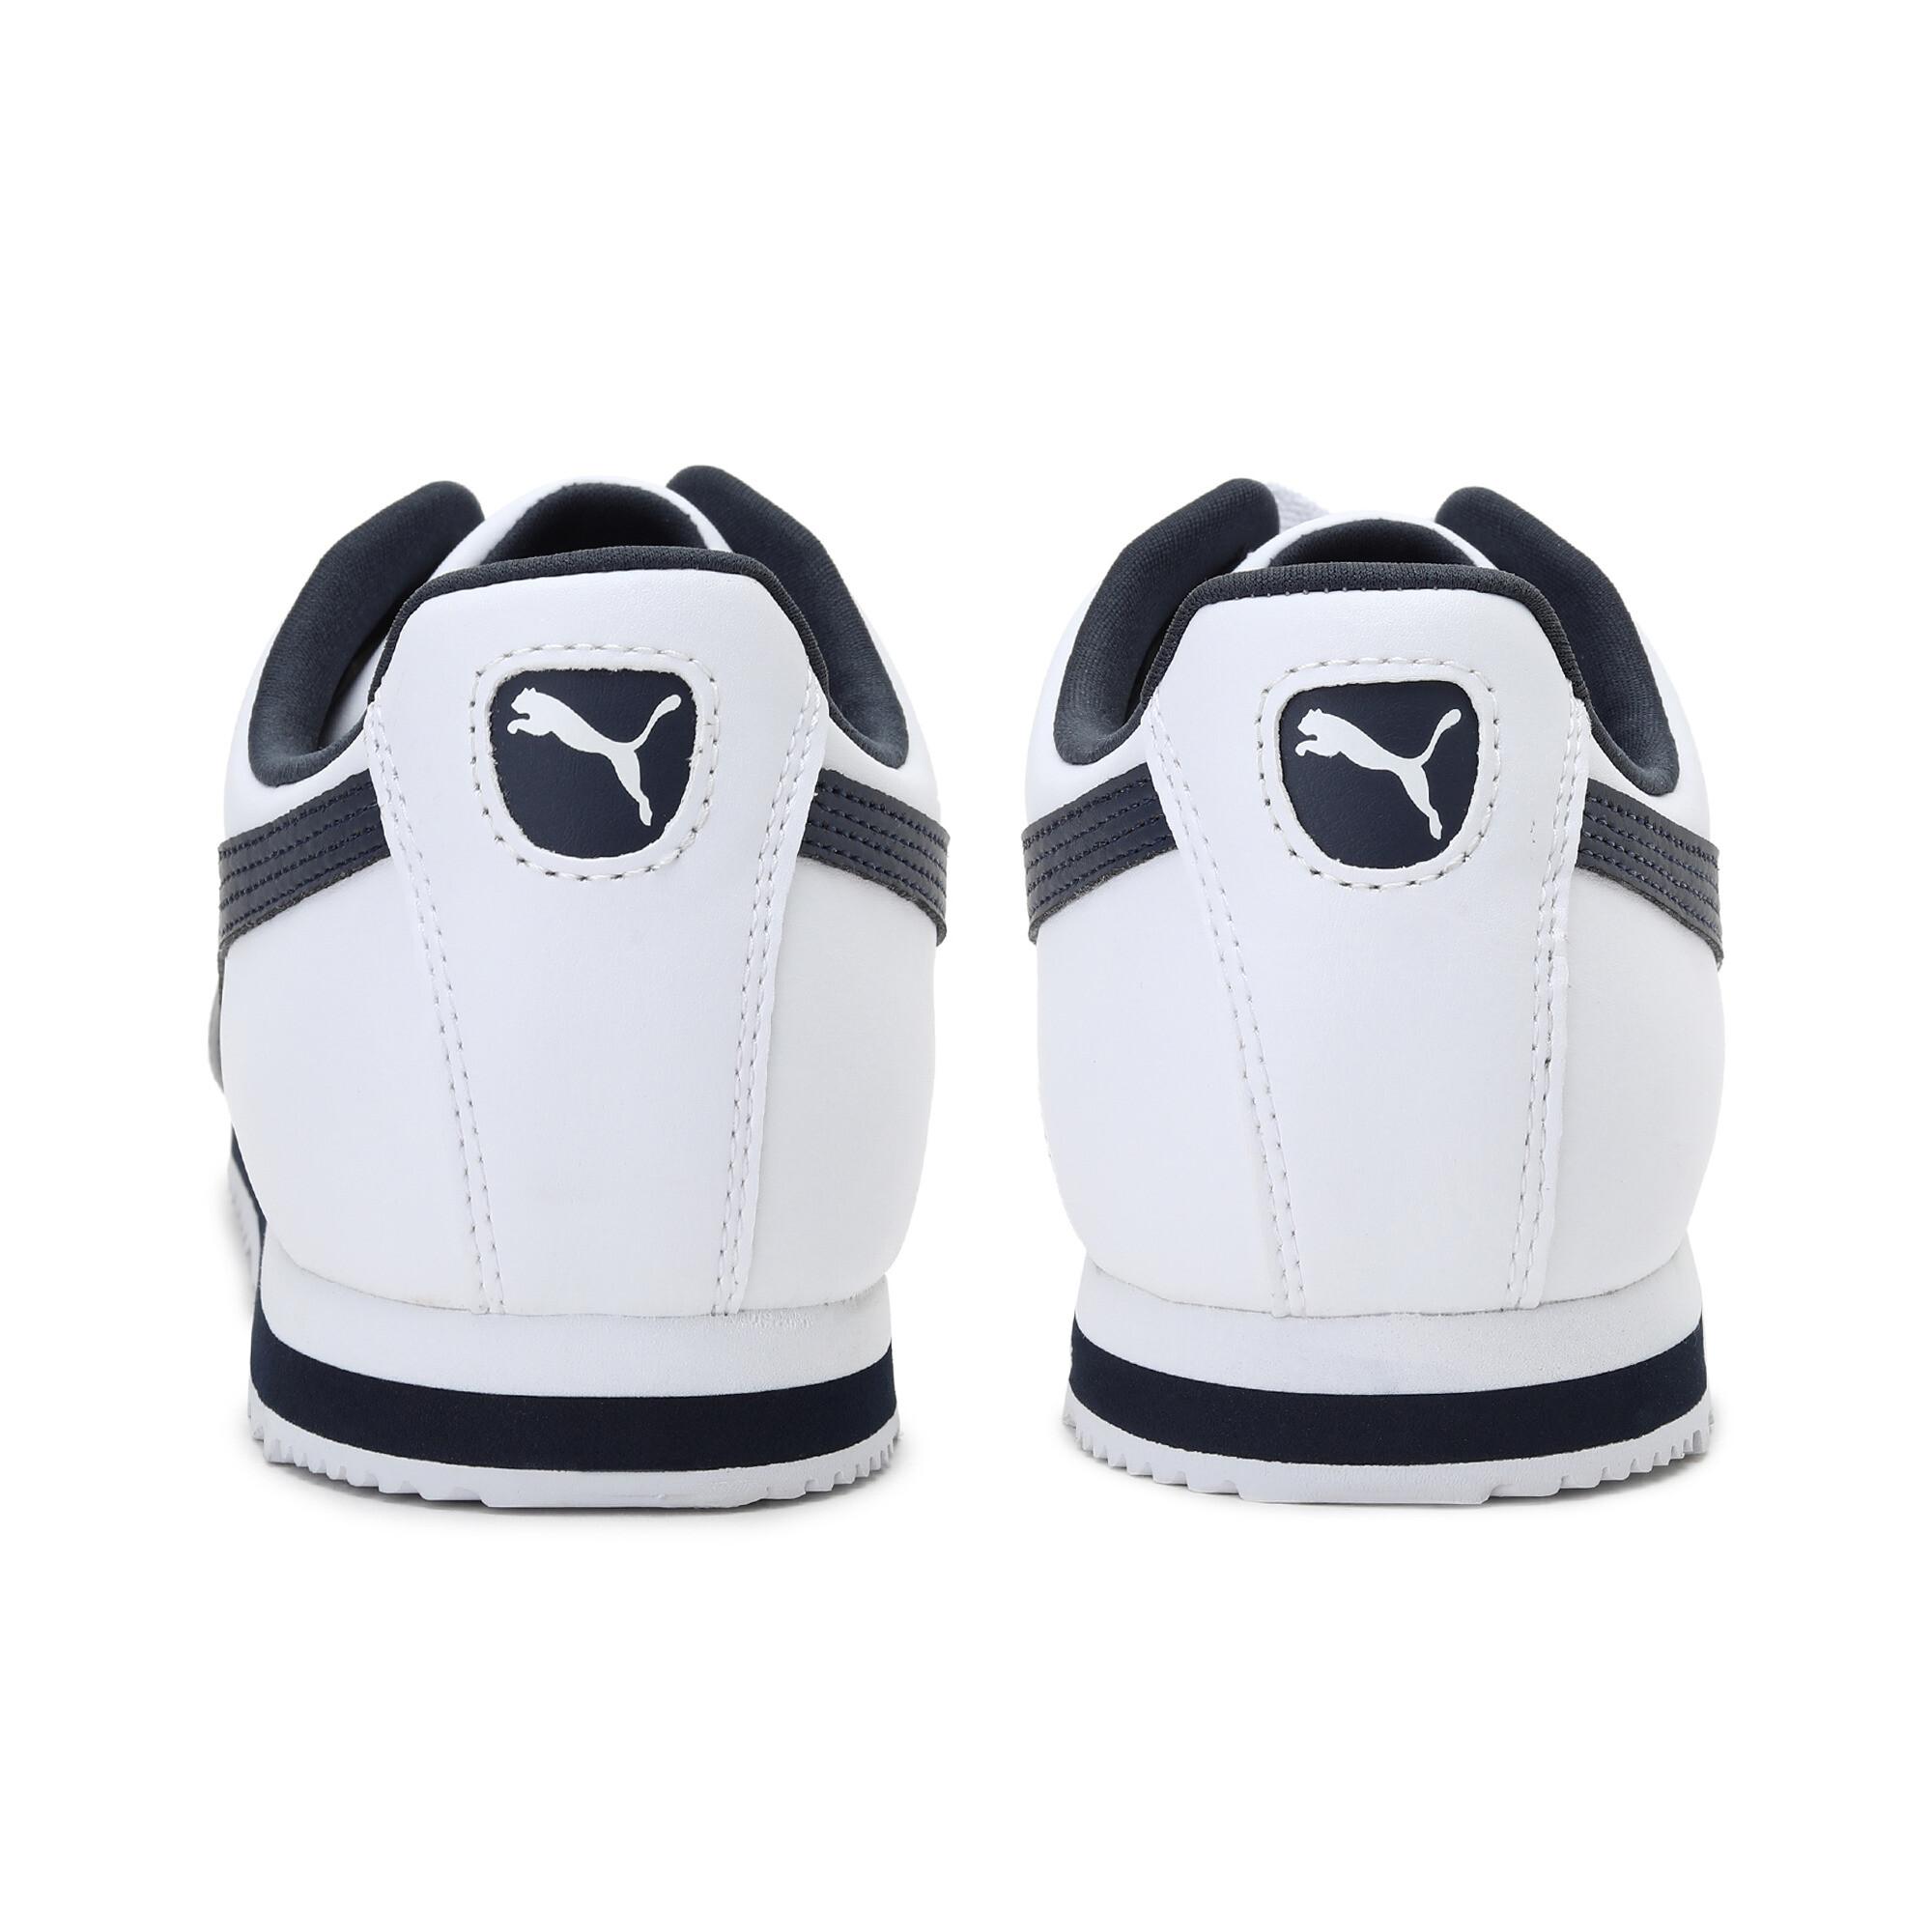 miniature 19 - Puma Men's Roma Basic Sneakers